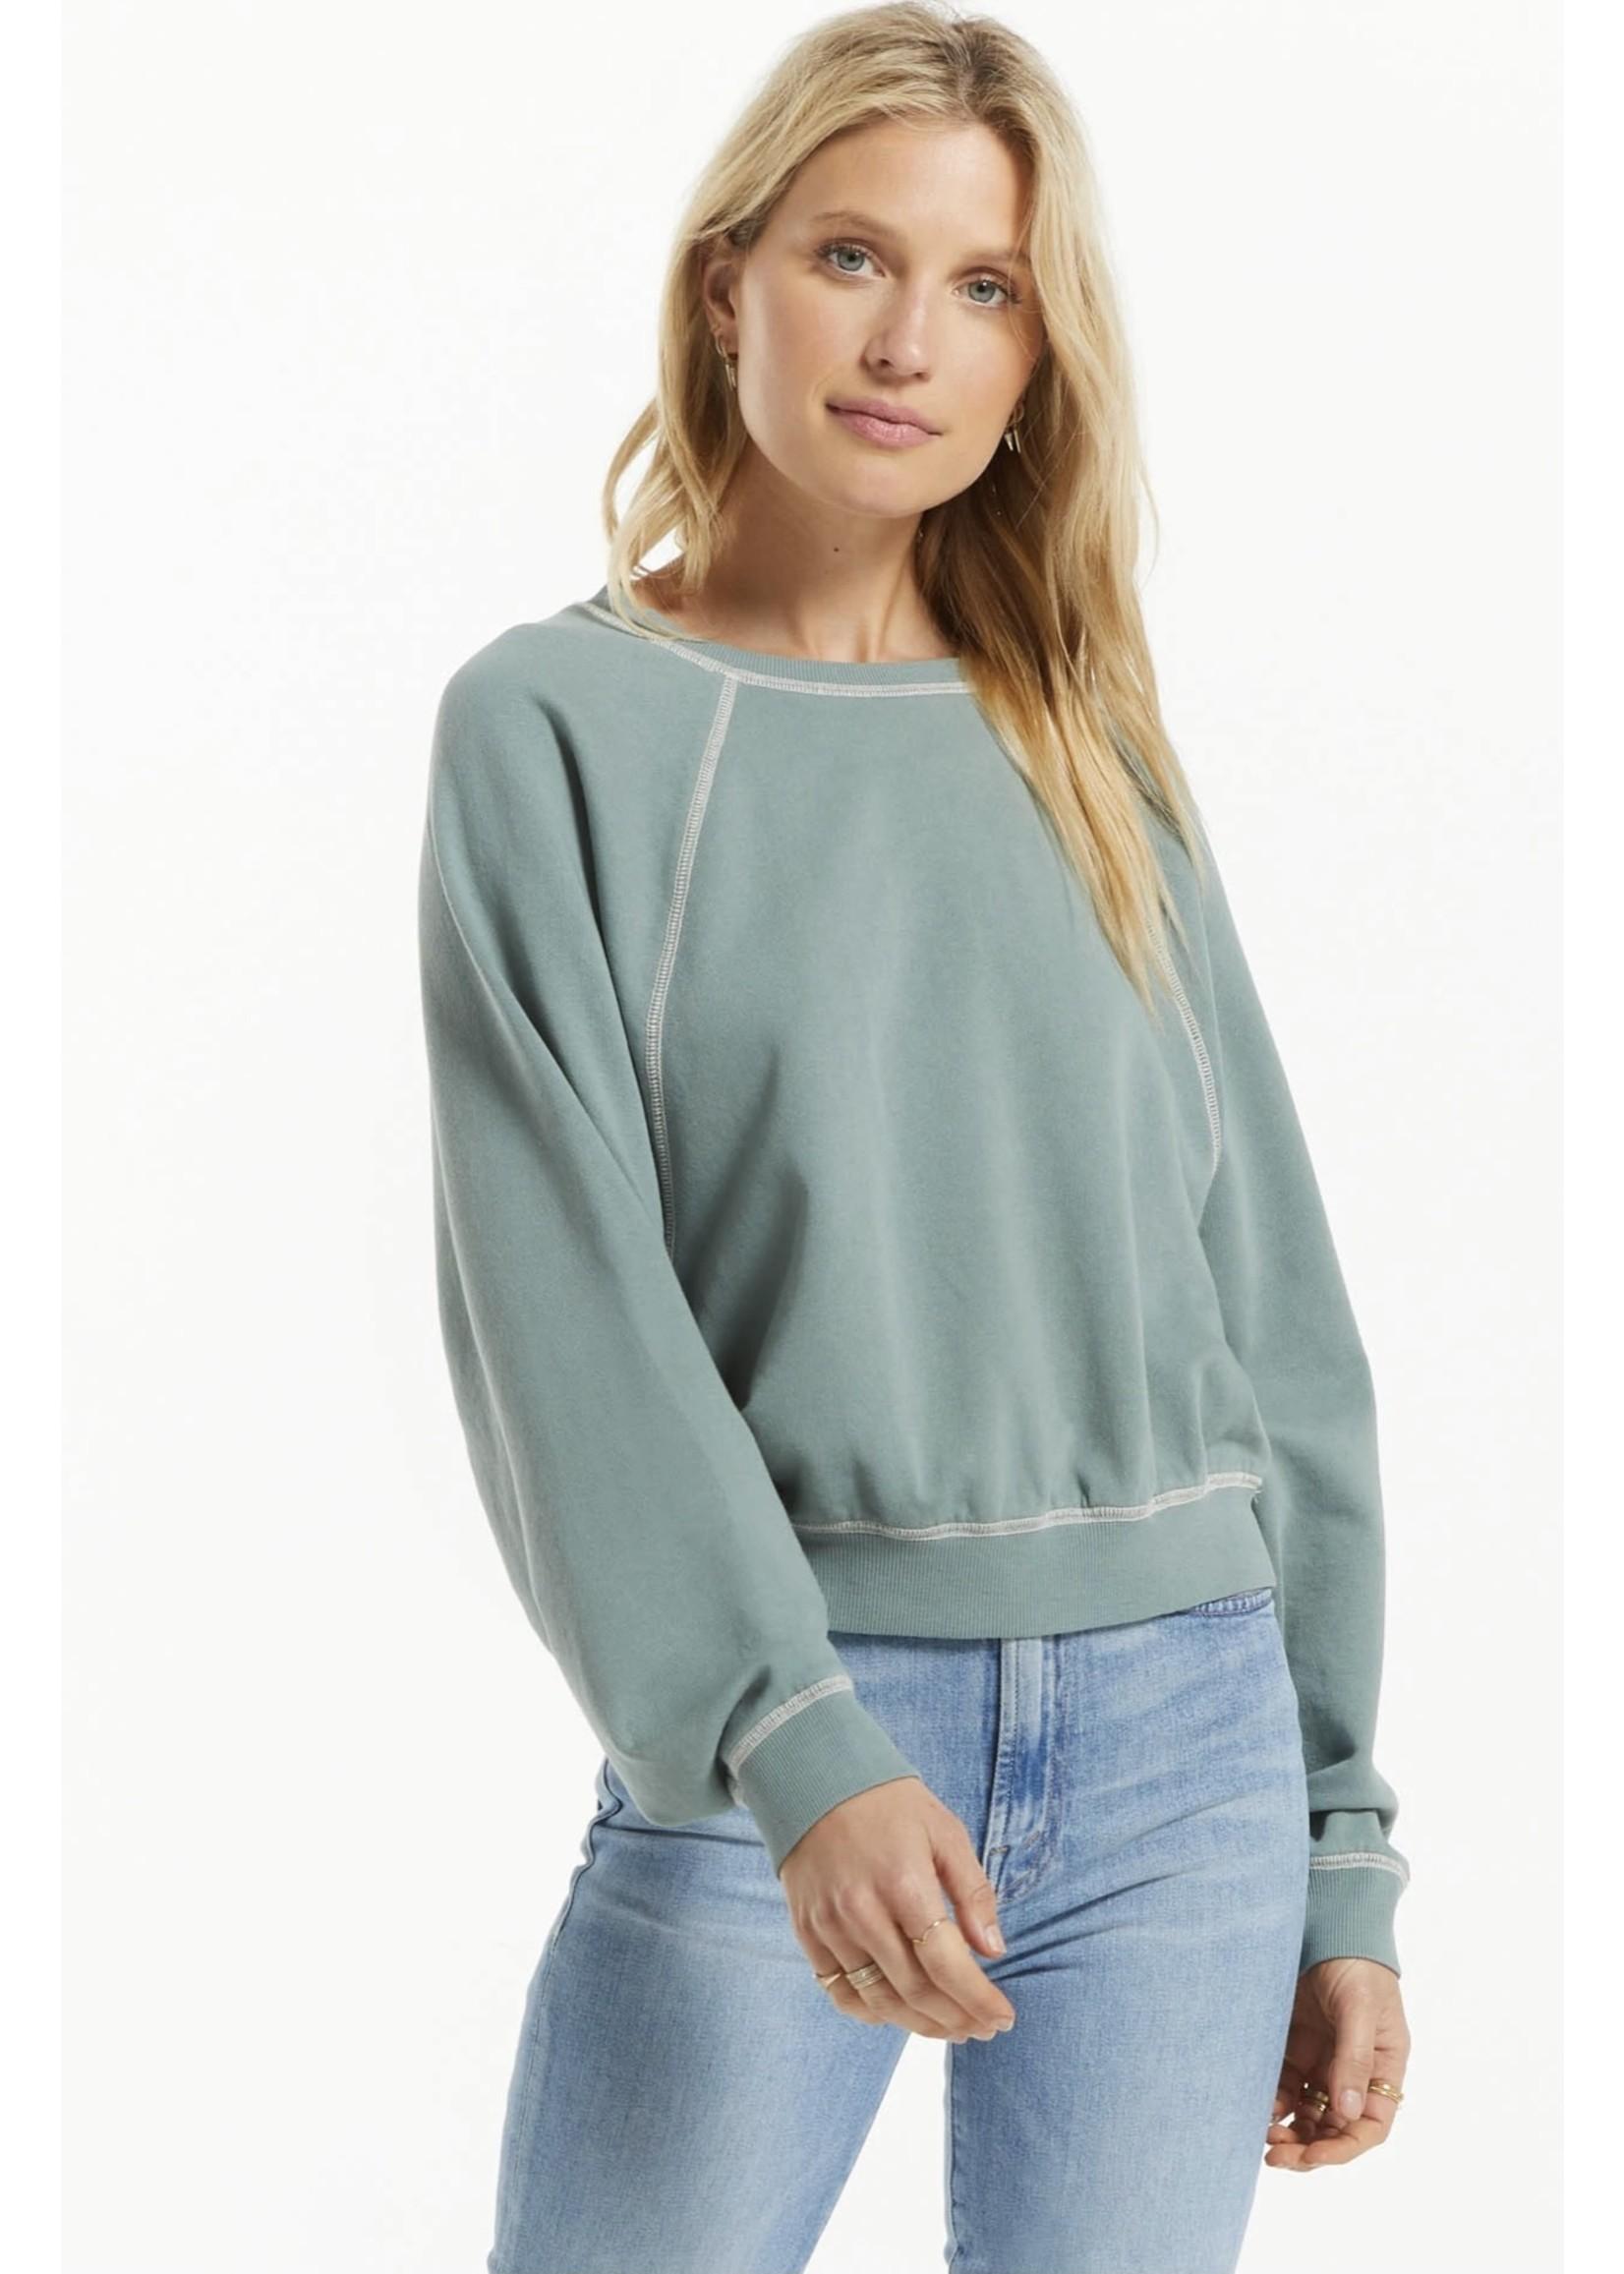 Z Supply Ami Organic Sweatshirt - ZT213832